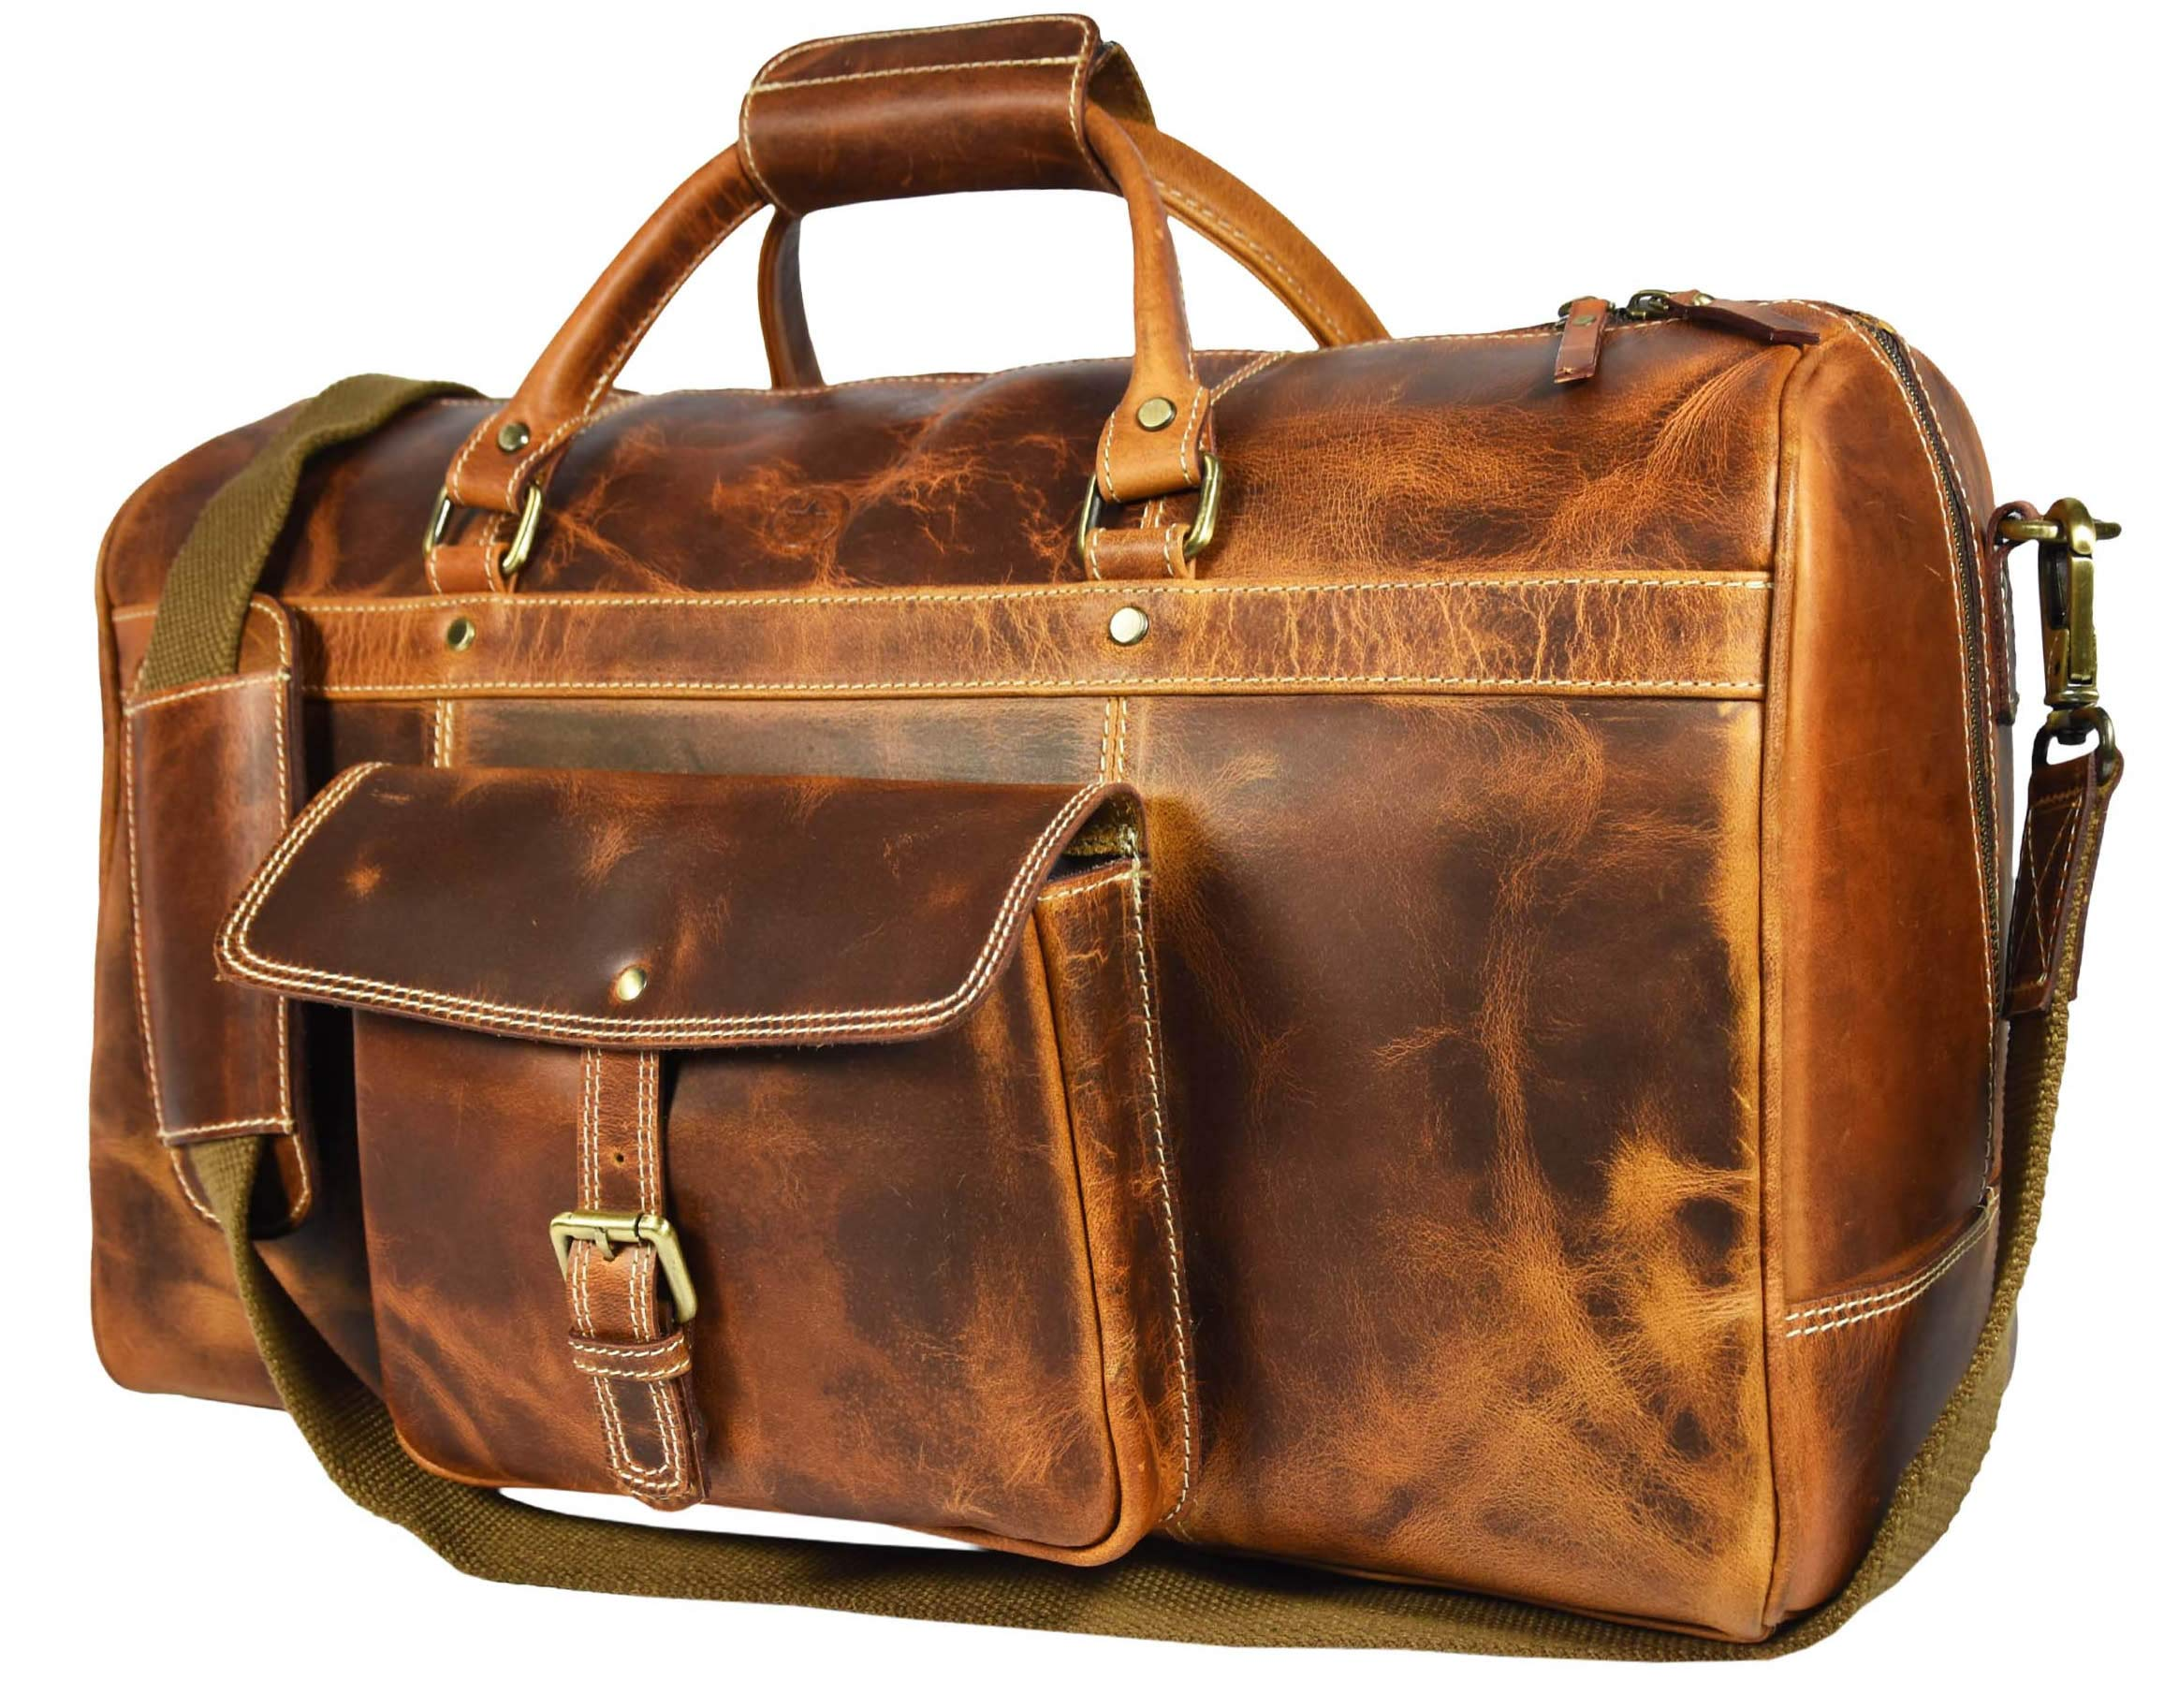 Aaron Leather 20 inch Full Grain Leather Weekender Duffle Bag (Caramel)